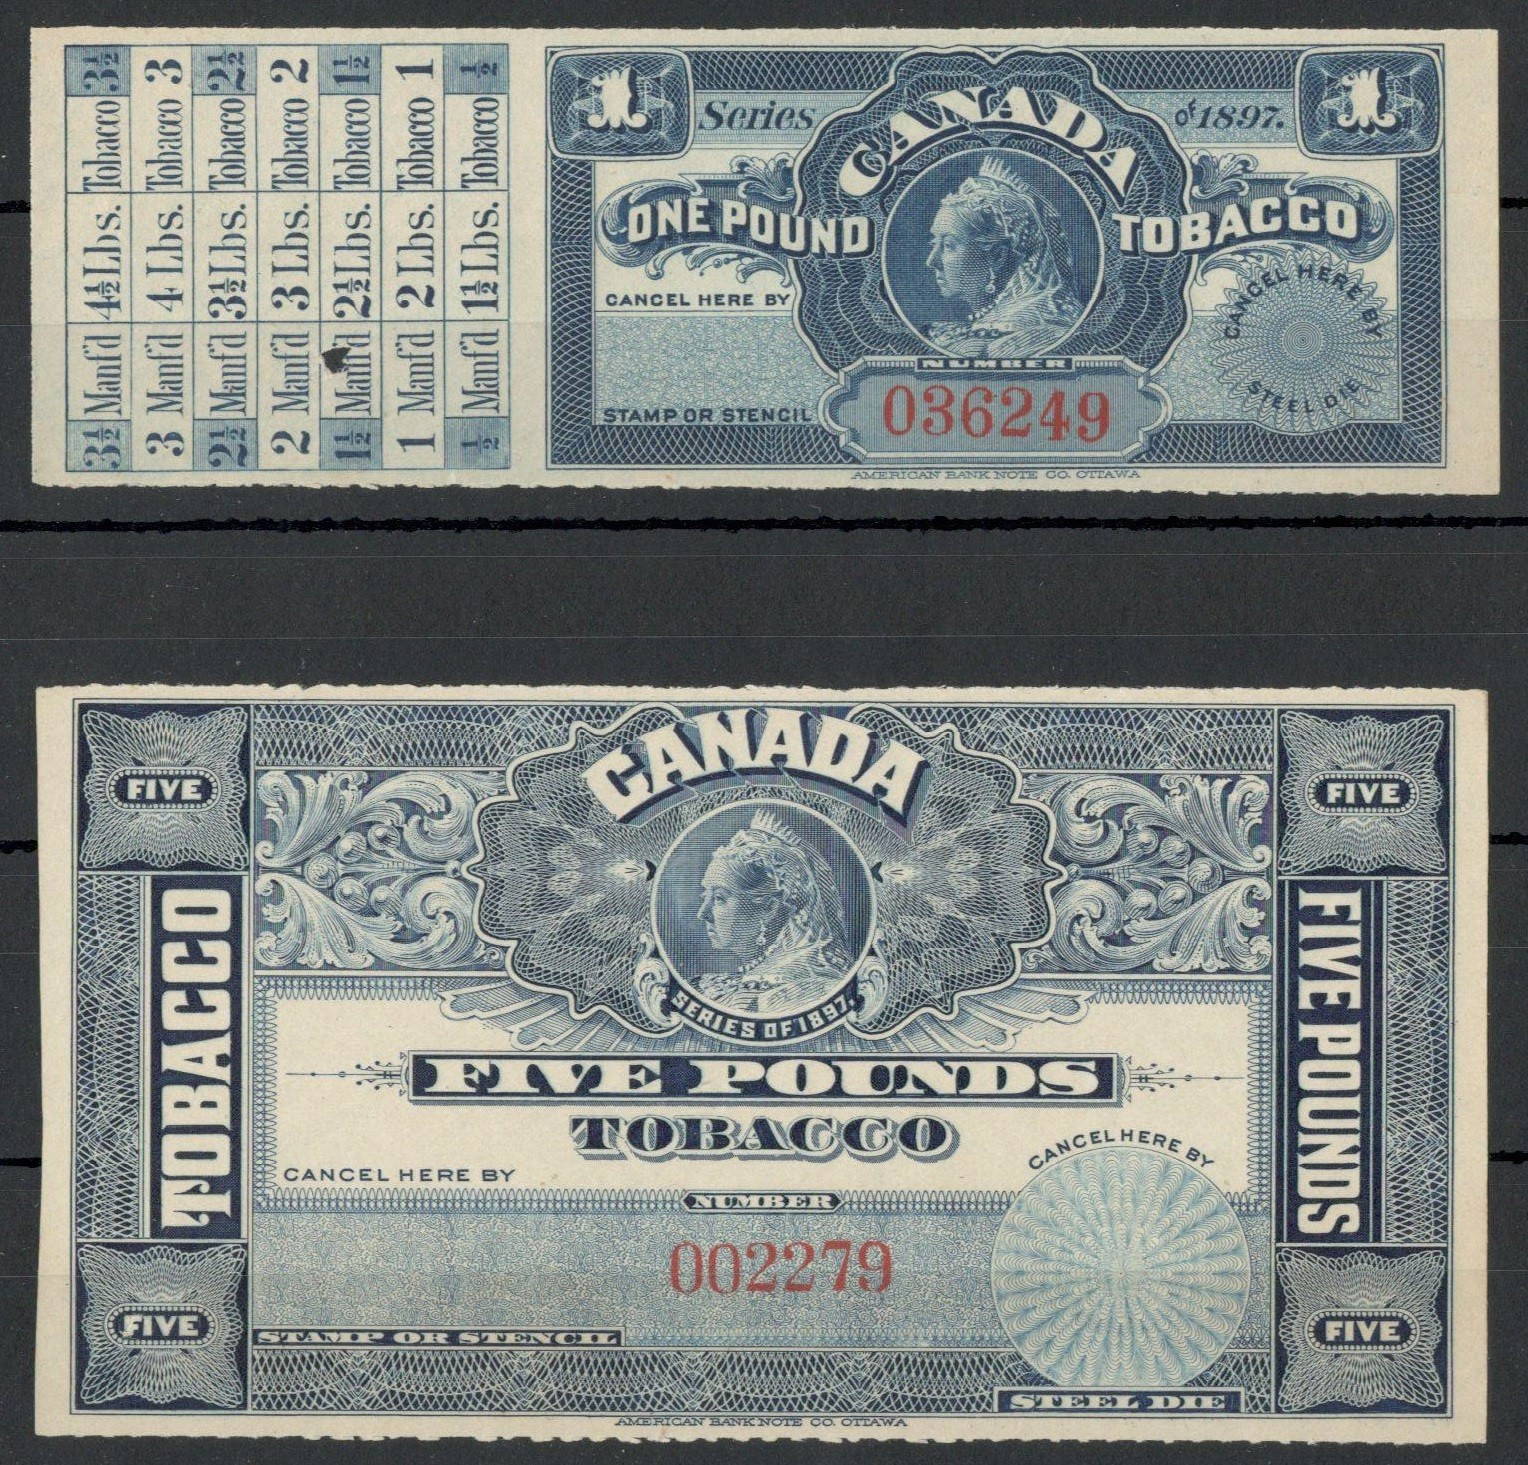 CANADA CUSTOMS TOBACCO ENTRY LABEL